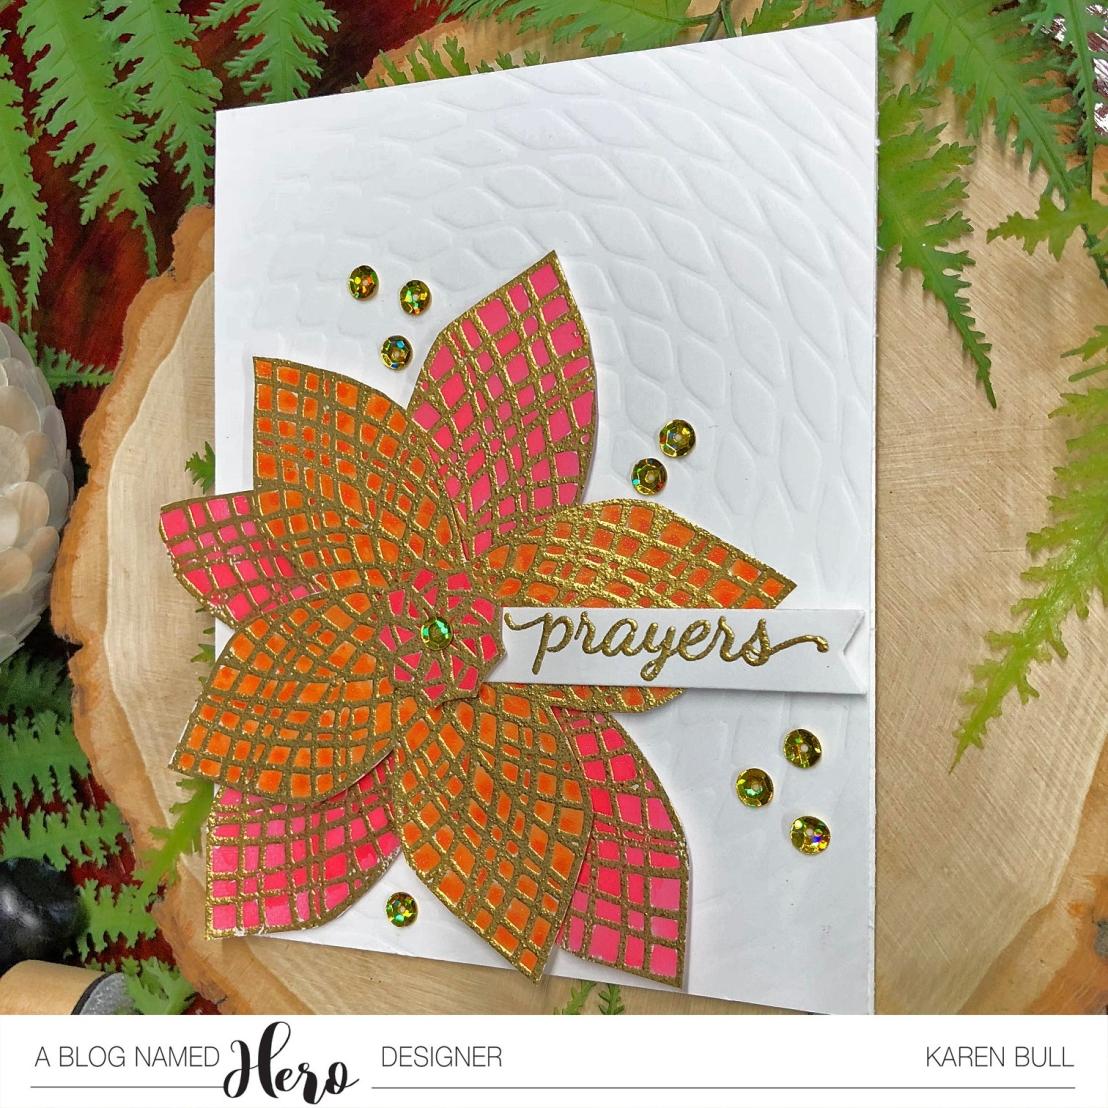 flower-card-details.jpg